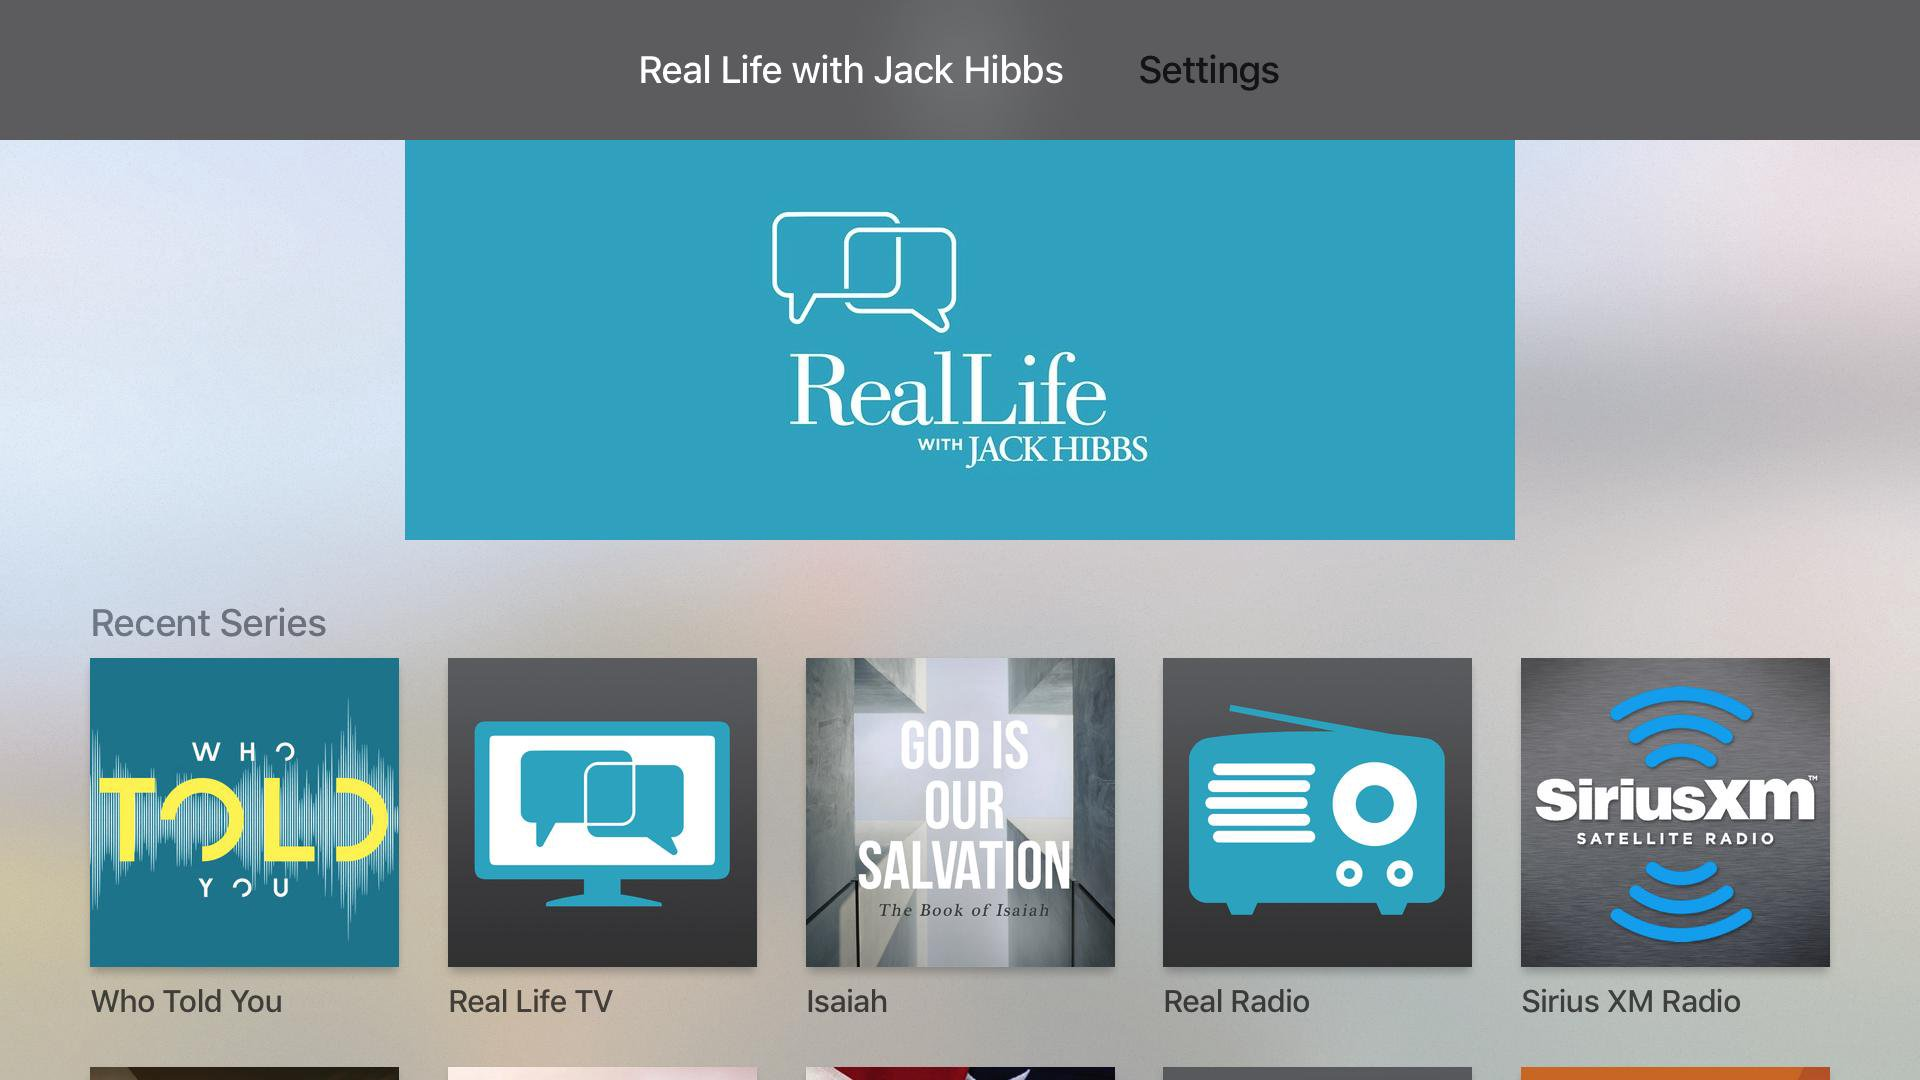 App - Real Life with Jack Hibbs